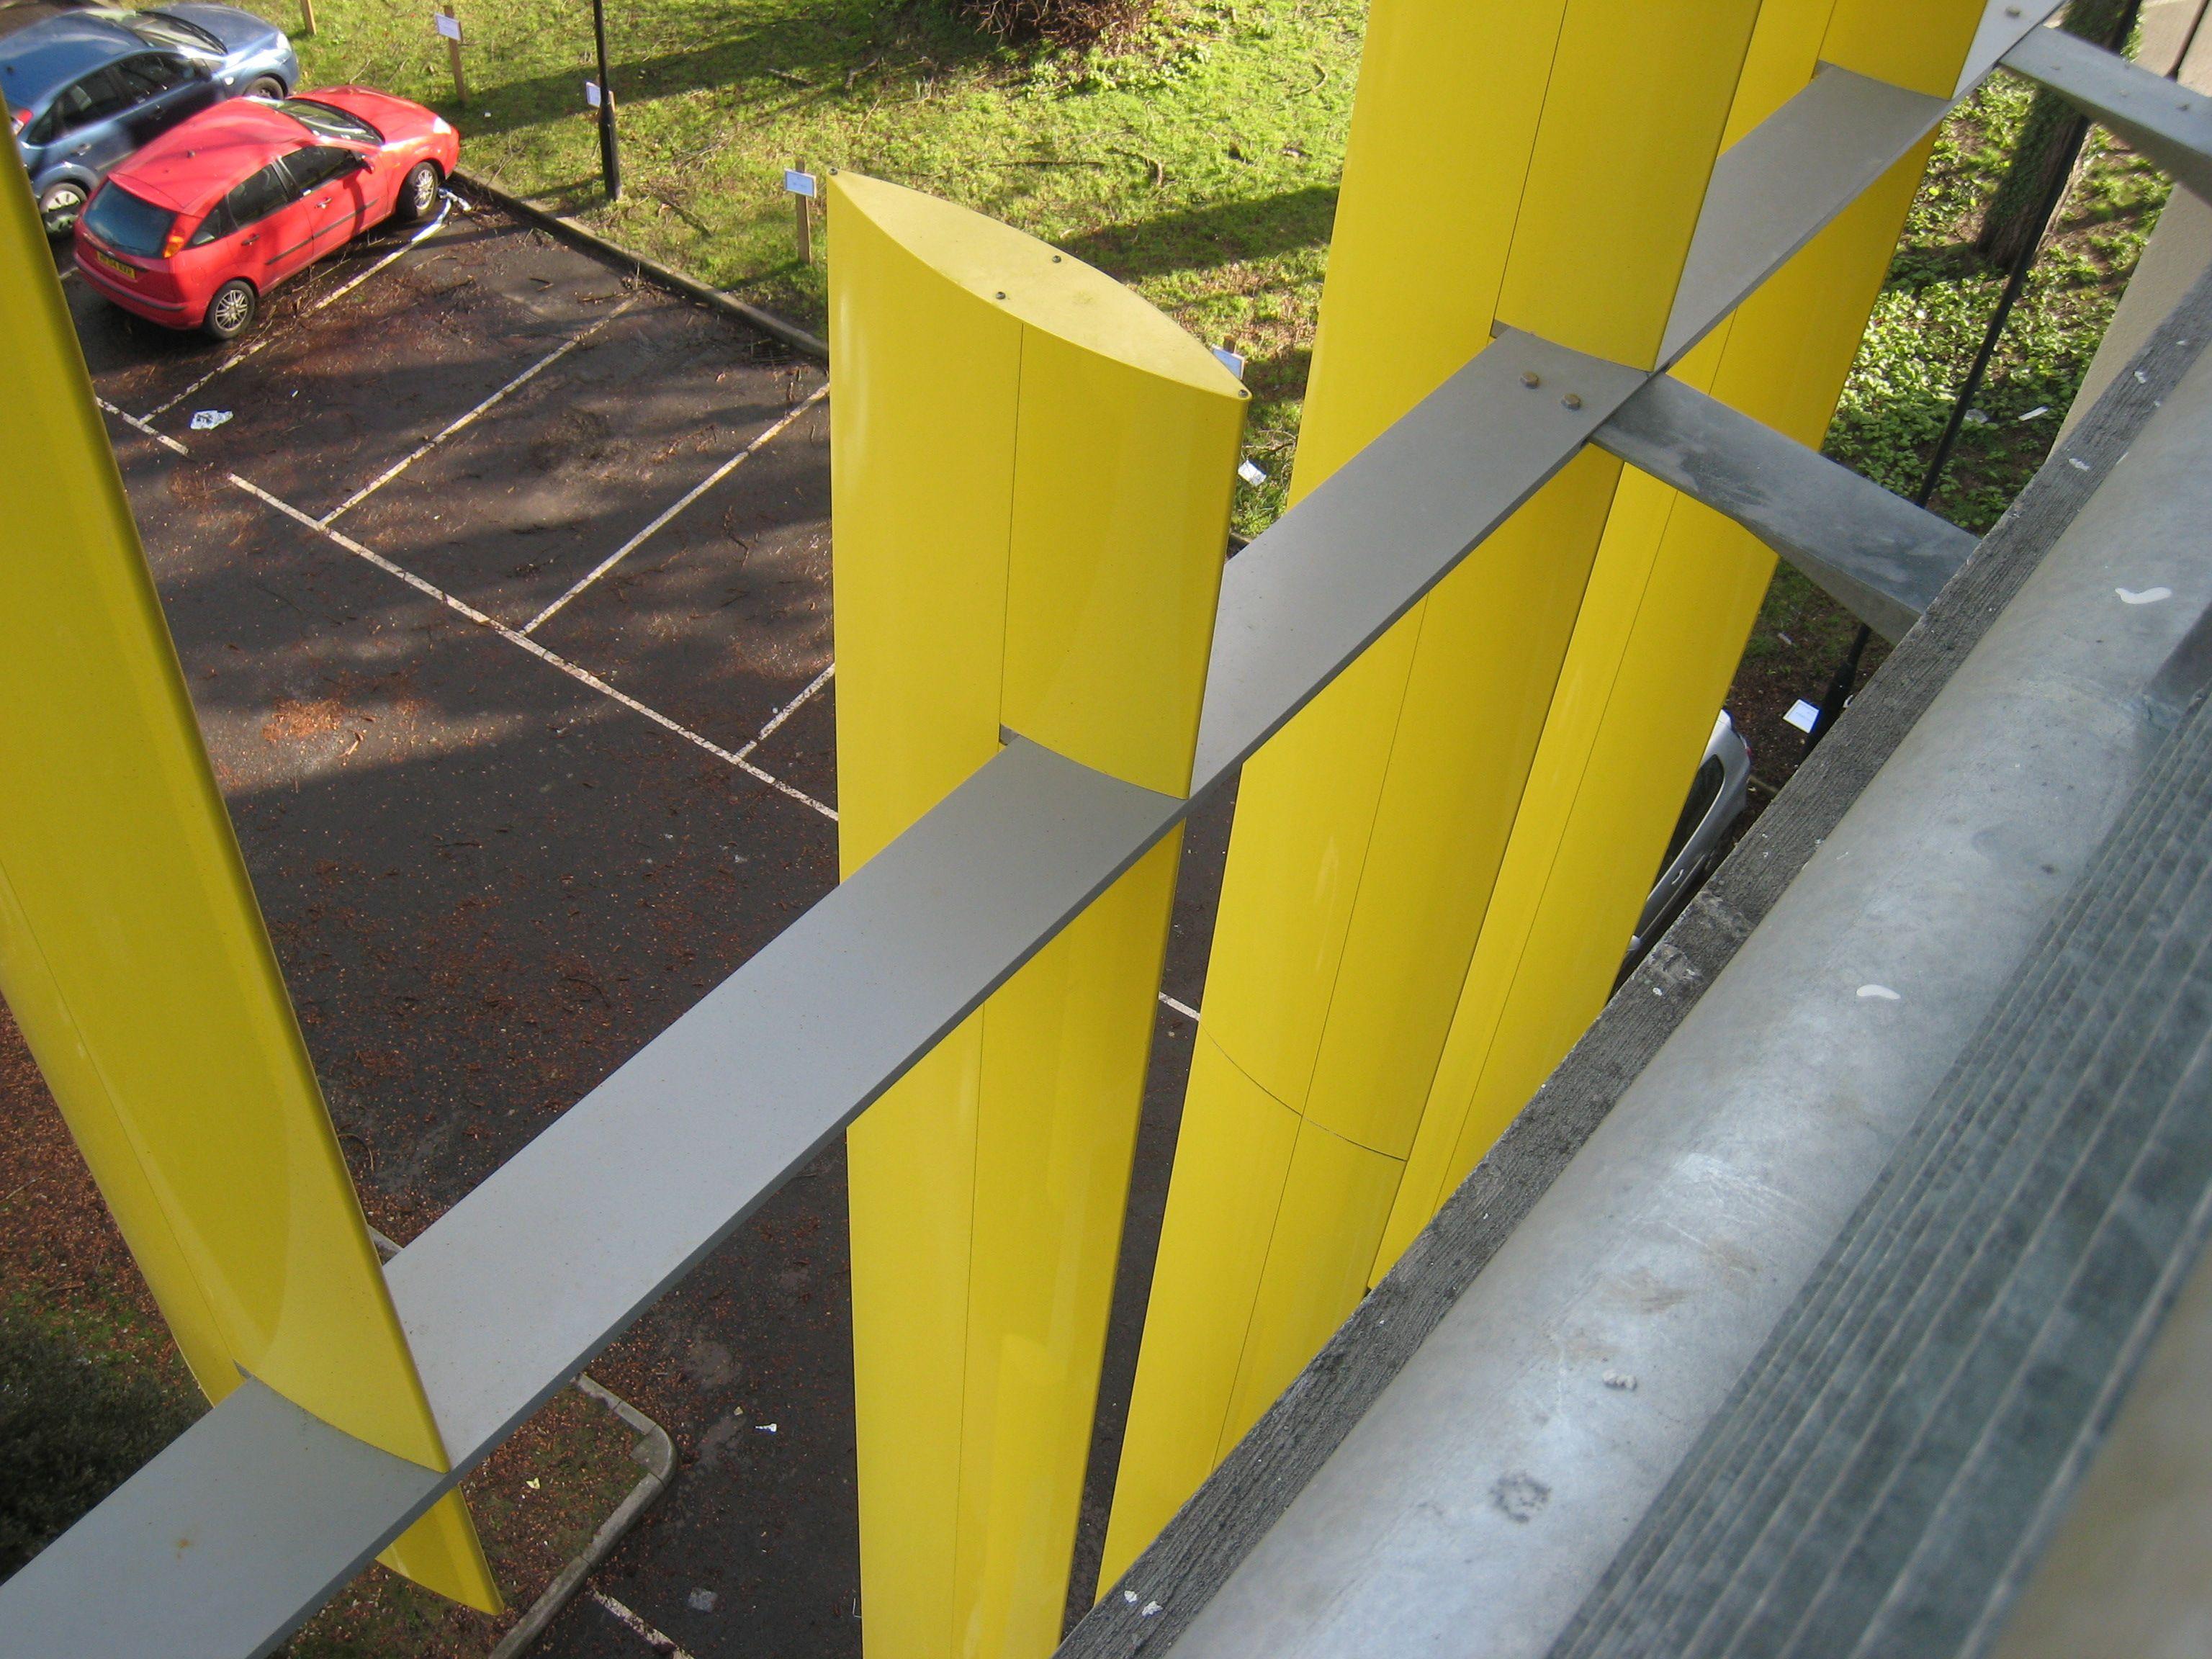 Madeira Road MSCP. Picture of Levolux fins.Another project that we worked on.. New build multi-storey car-park (ParkMark Safer Parking Approved). #BuildingOptions #QS #Construction #Consultants #CBC #Bournemouth #QuantitySurveyor #ProjectManager #CommercialManagement #Refurb #NewBuild #Commercial #BQ #Developer #JigsawSolutions #EmployersAgent  #CostPlanning #JointVentures #Property #MSCP #CarPark #ParkMark #SaferParking www.BuildingOptions.co.uk